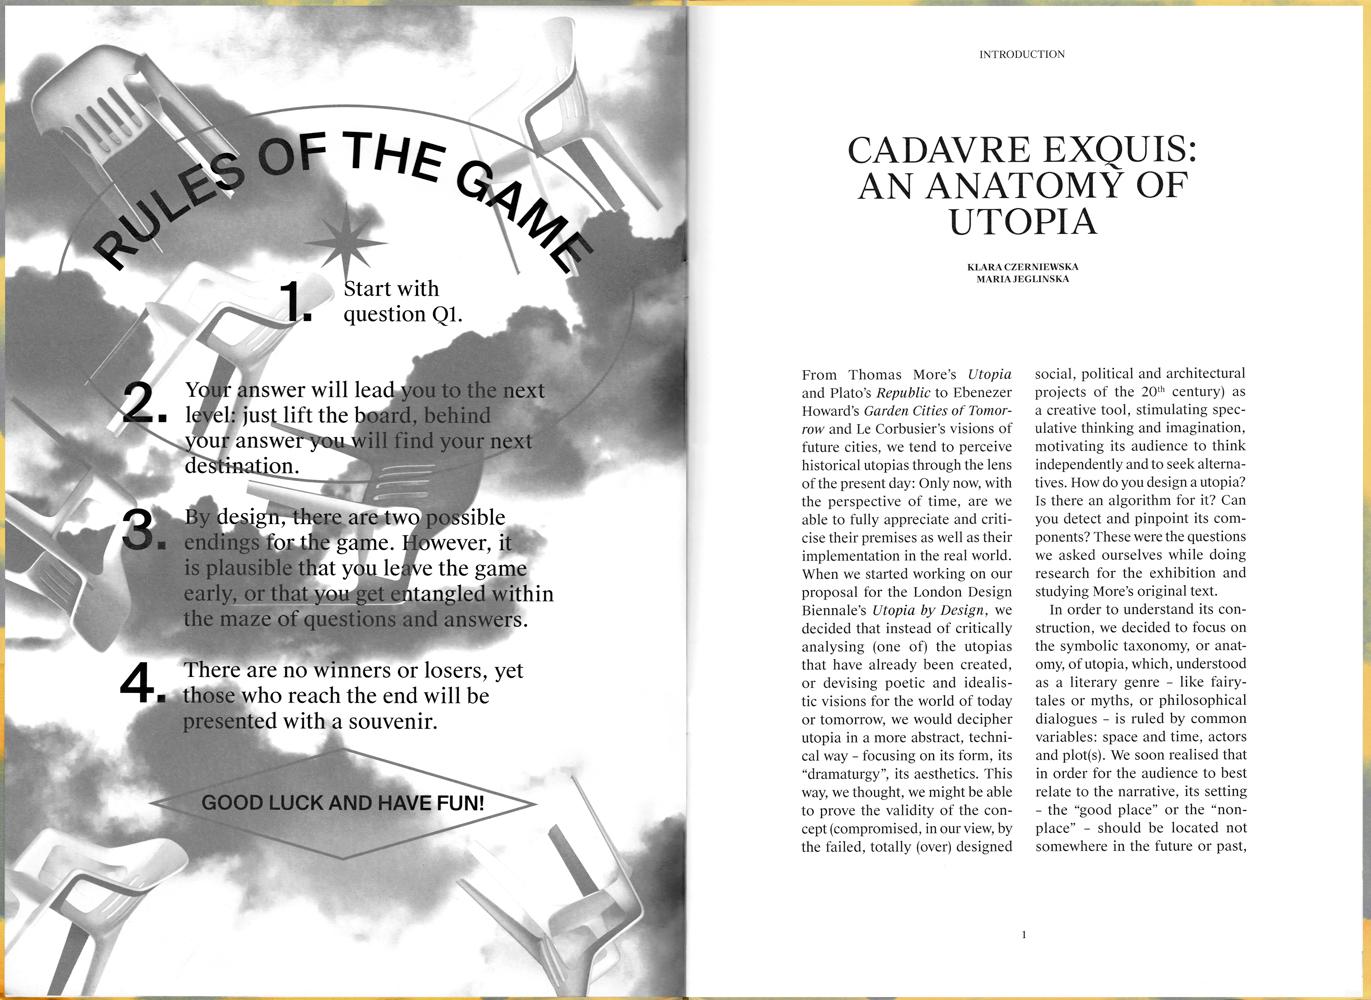 Cadavre Exquis: An Anatomy of Utopia – who decides who decides